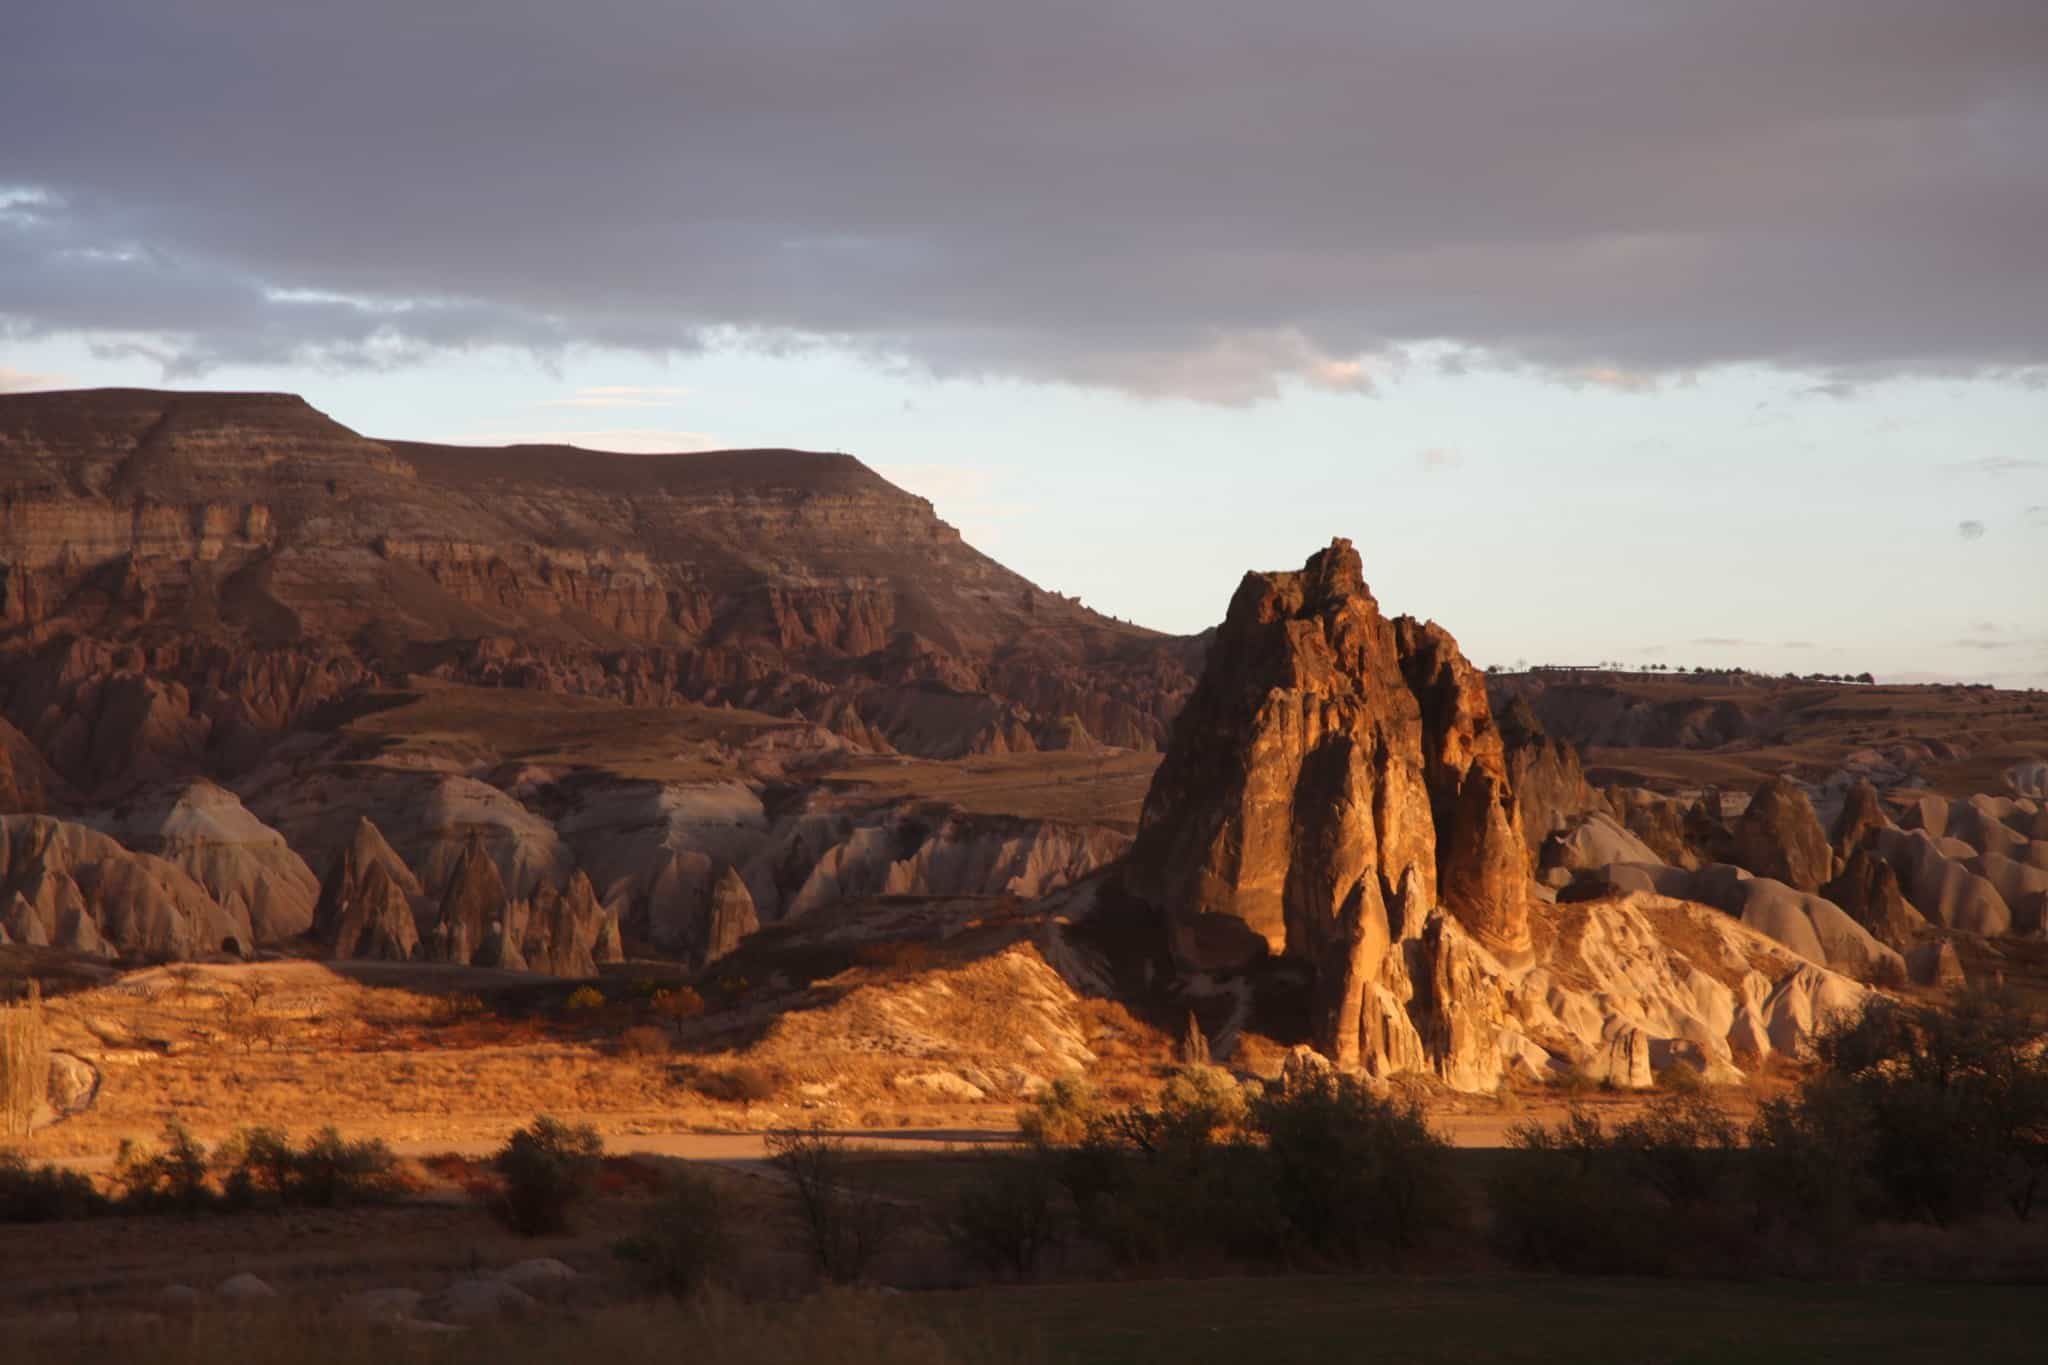 Cappadocia Pictures Monolith